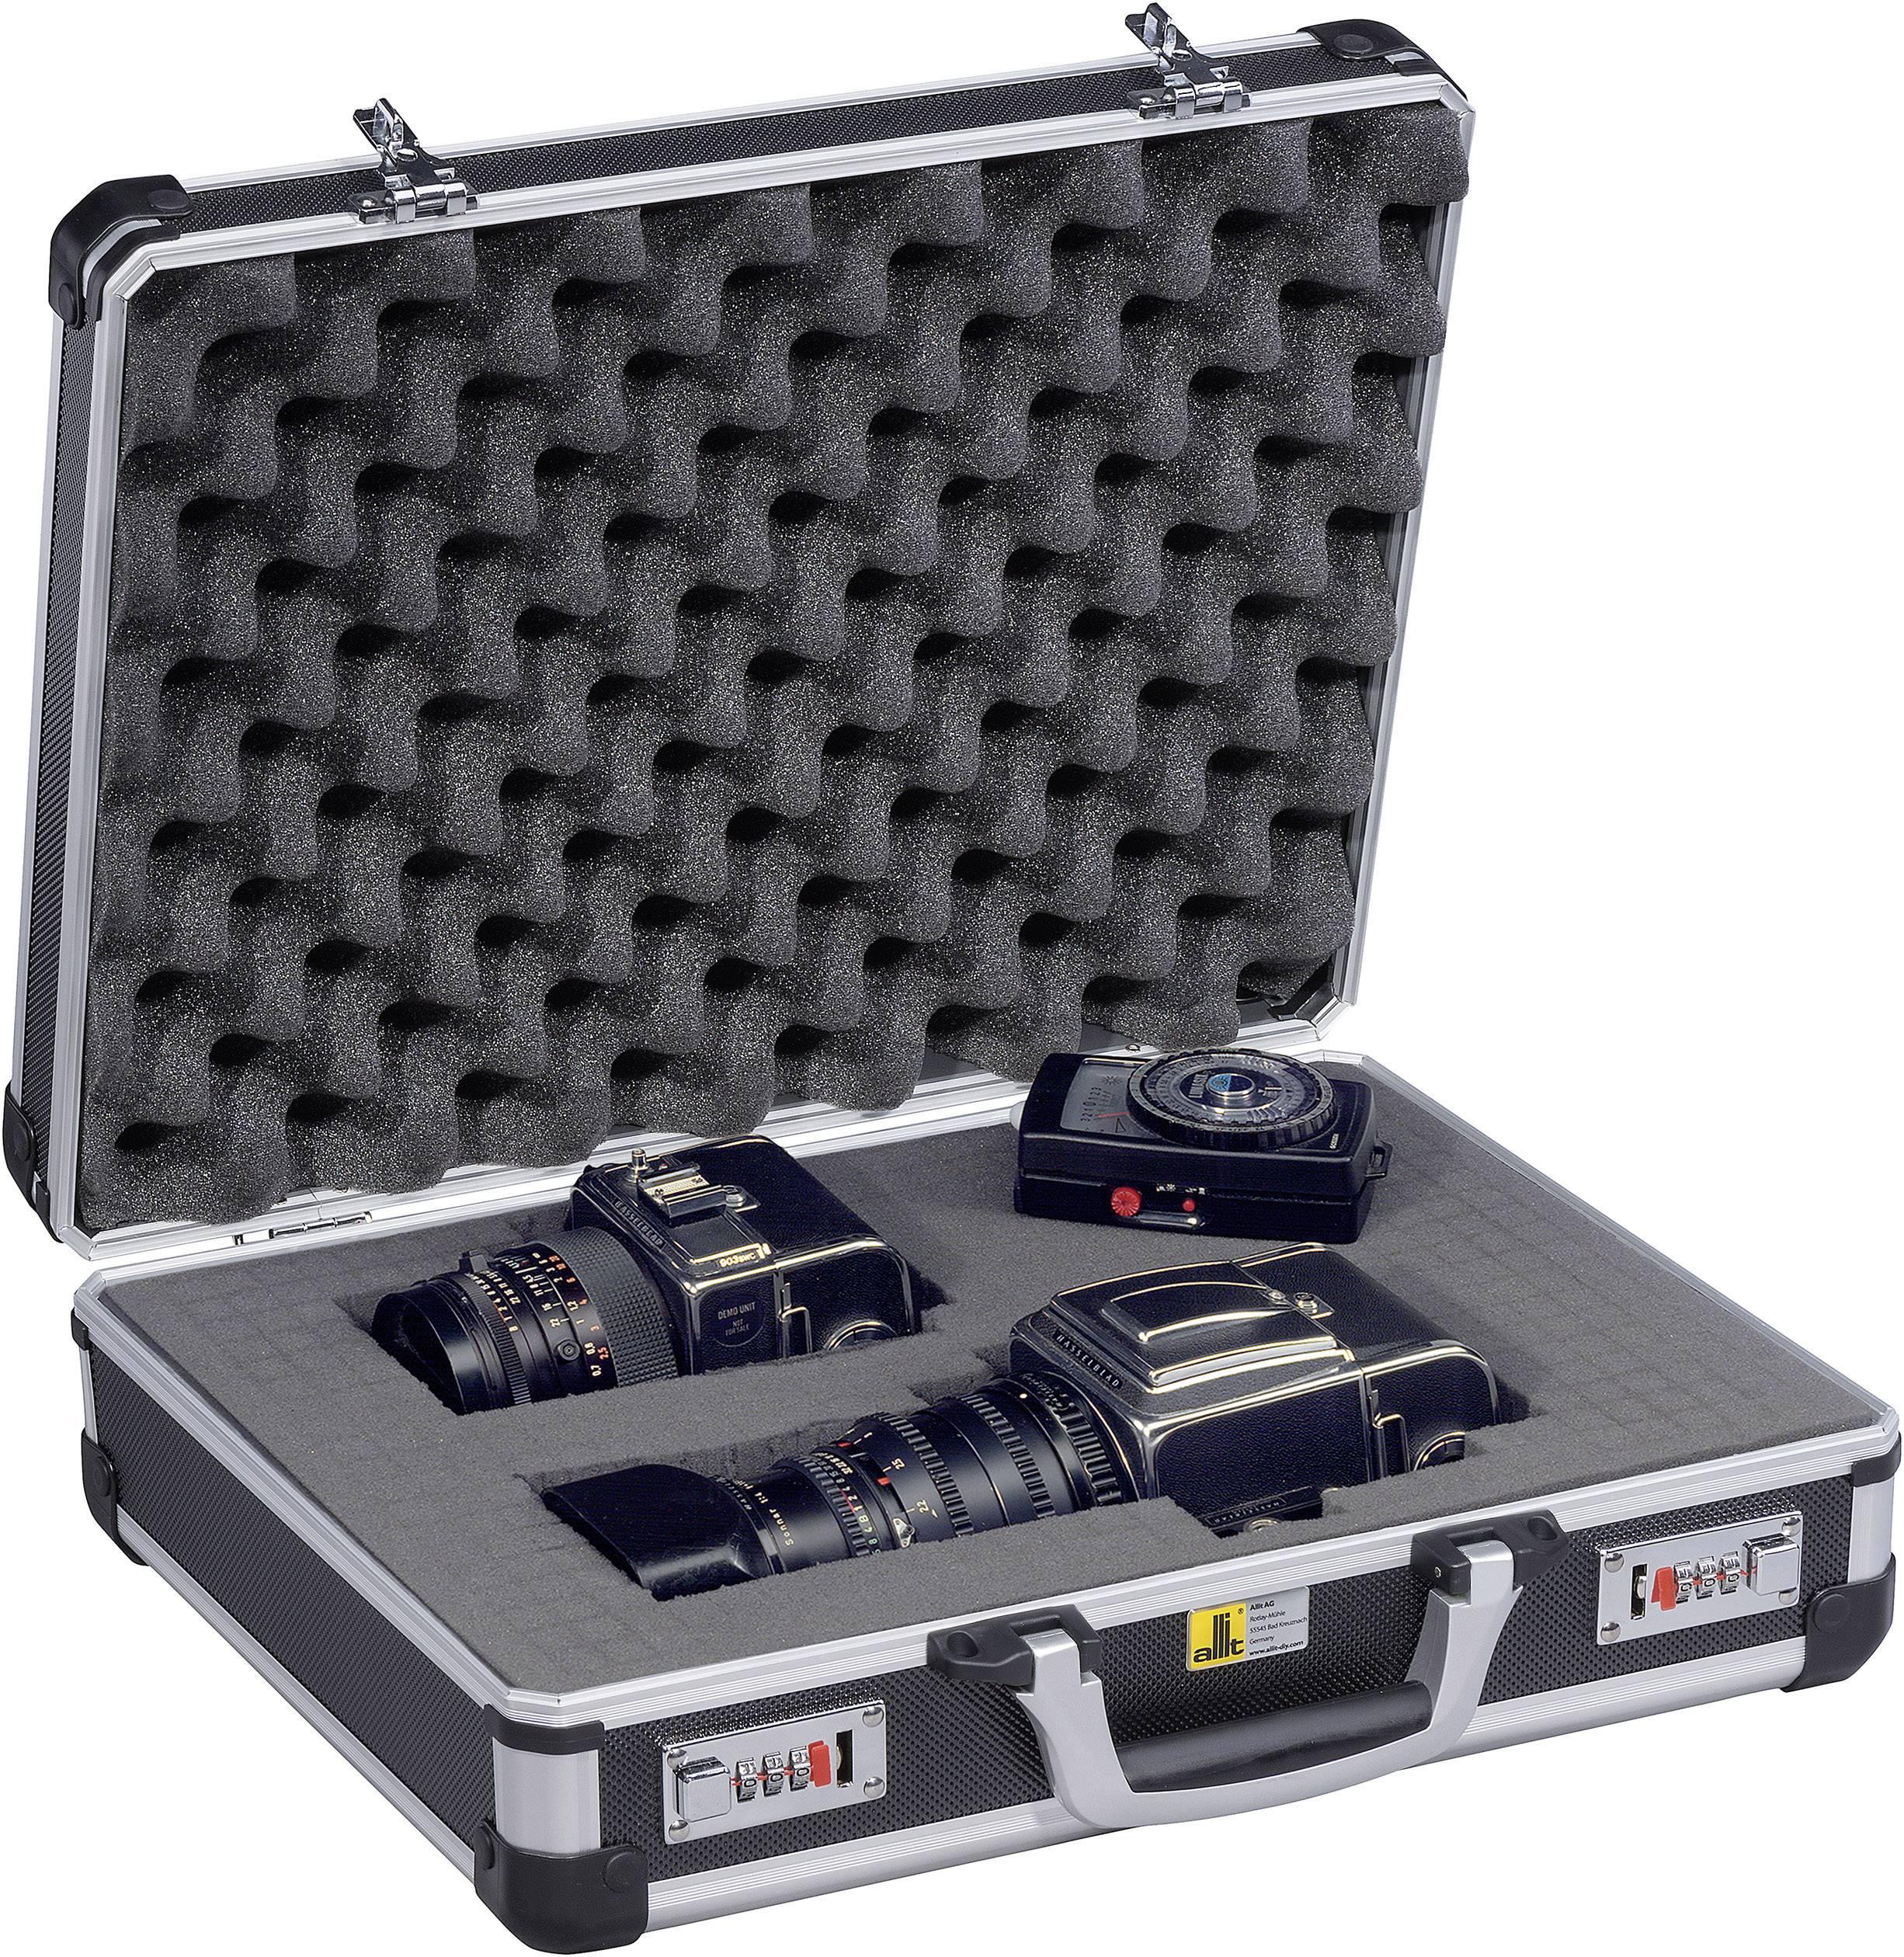 Kufrík na náradie Allit AluPlus Protect C 44 425810, (d x š x v) 445 x 370 x 145 mm